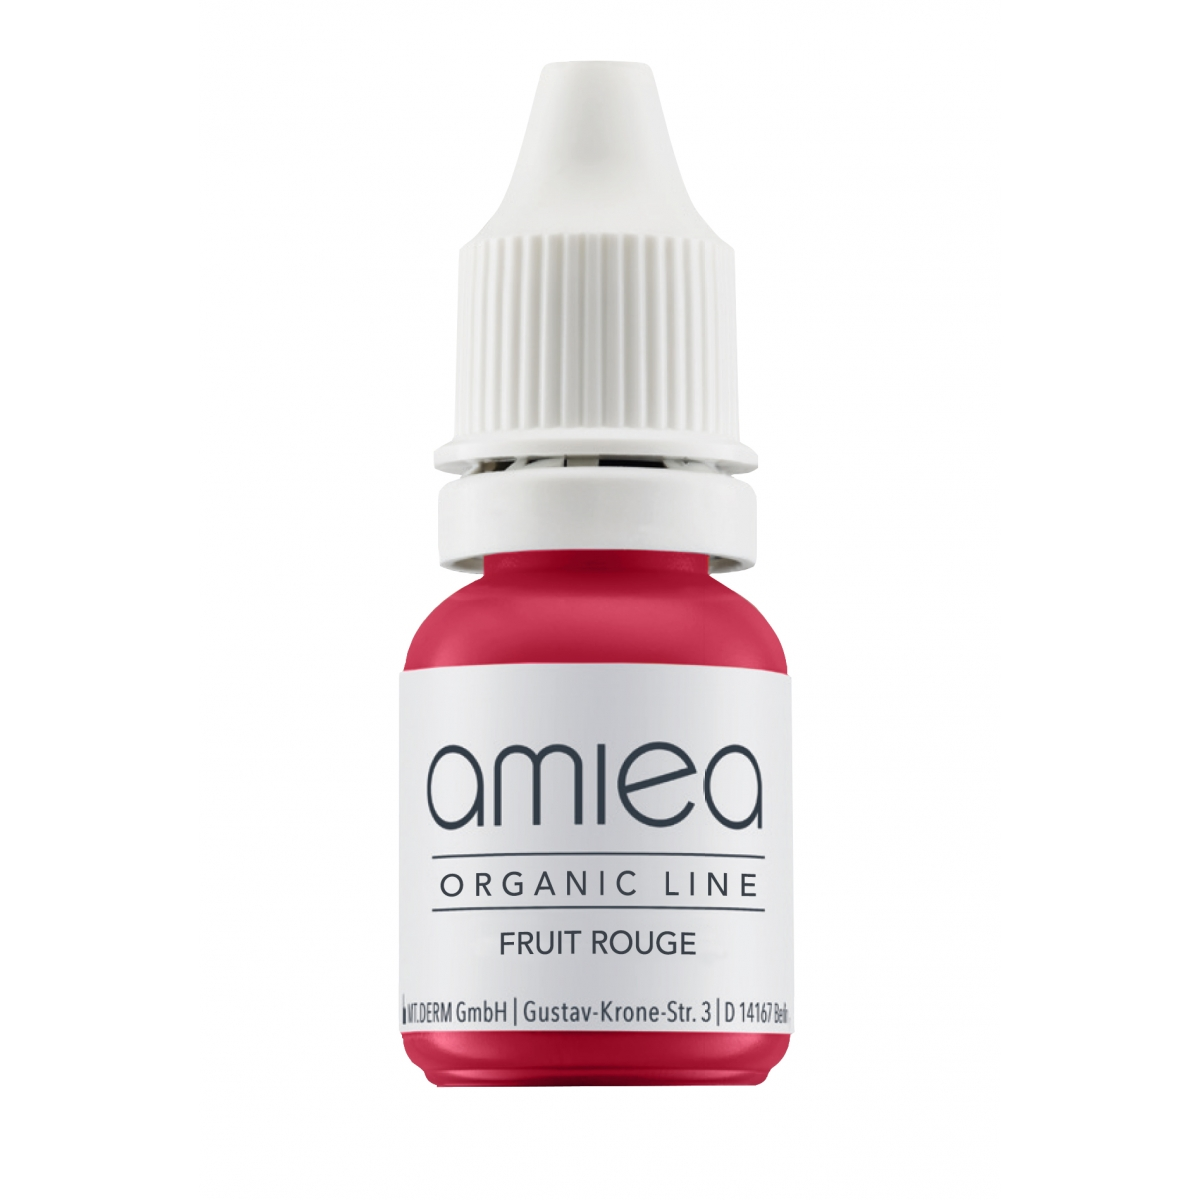 ORGANIC LINE (10ml) - PIGMENT FRUIT ROUGE ORGANICLINE AMIEA (10 ml)